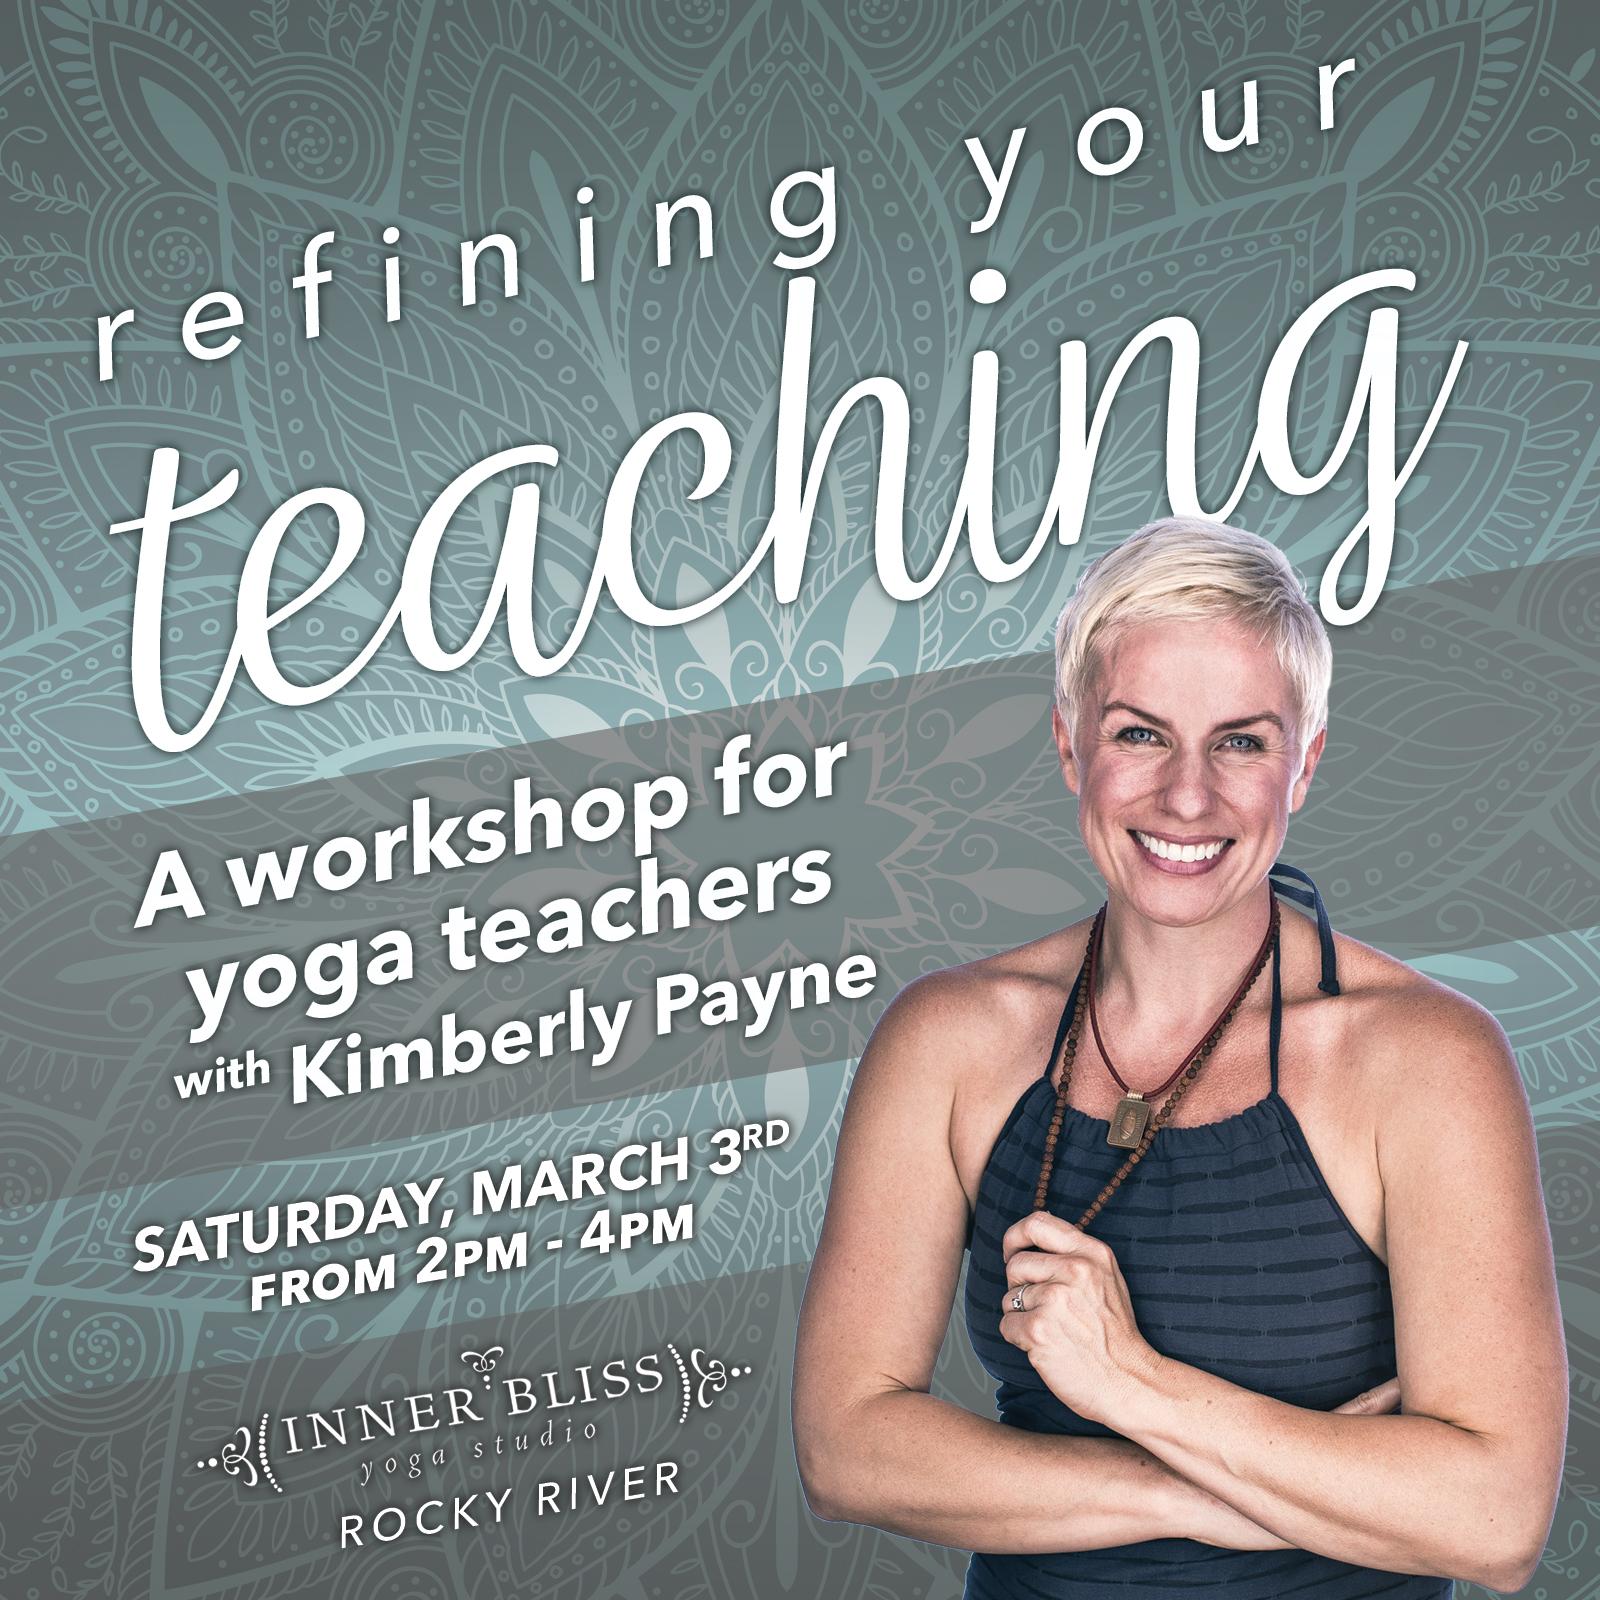 iby-Refining-Your-Teaching.jpg